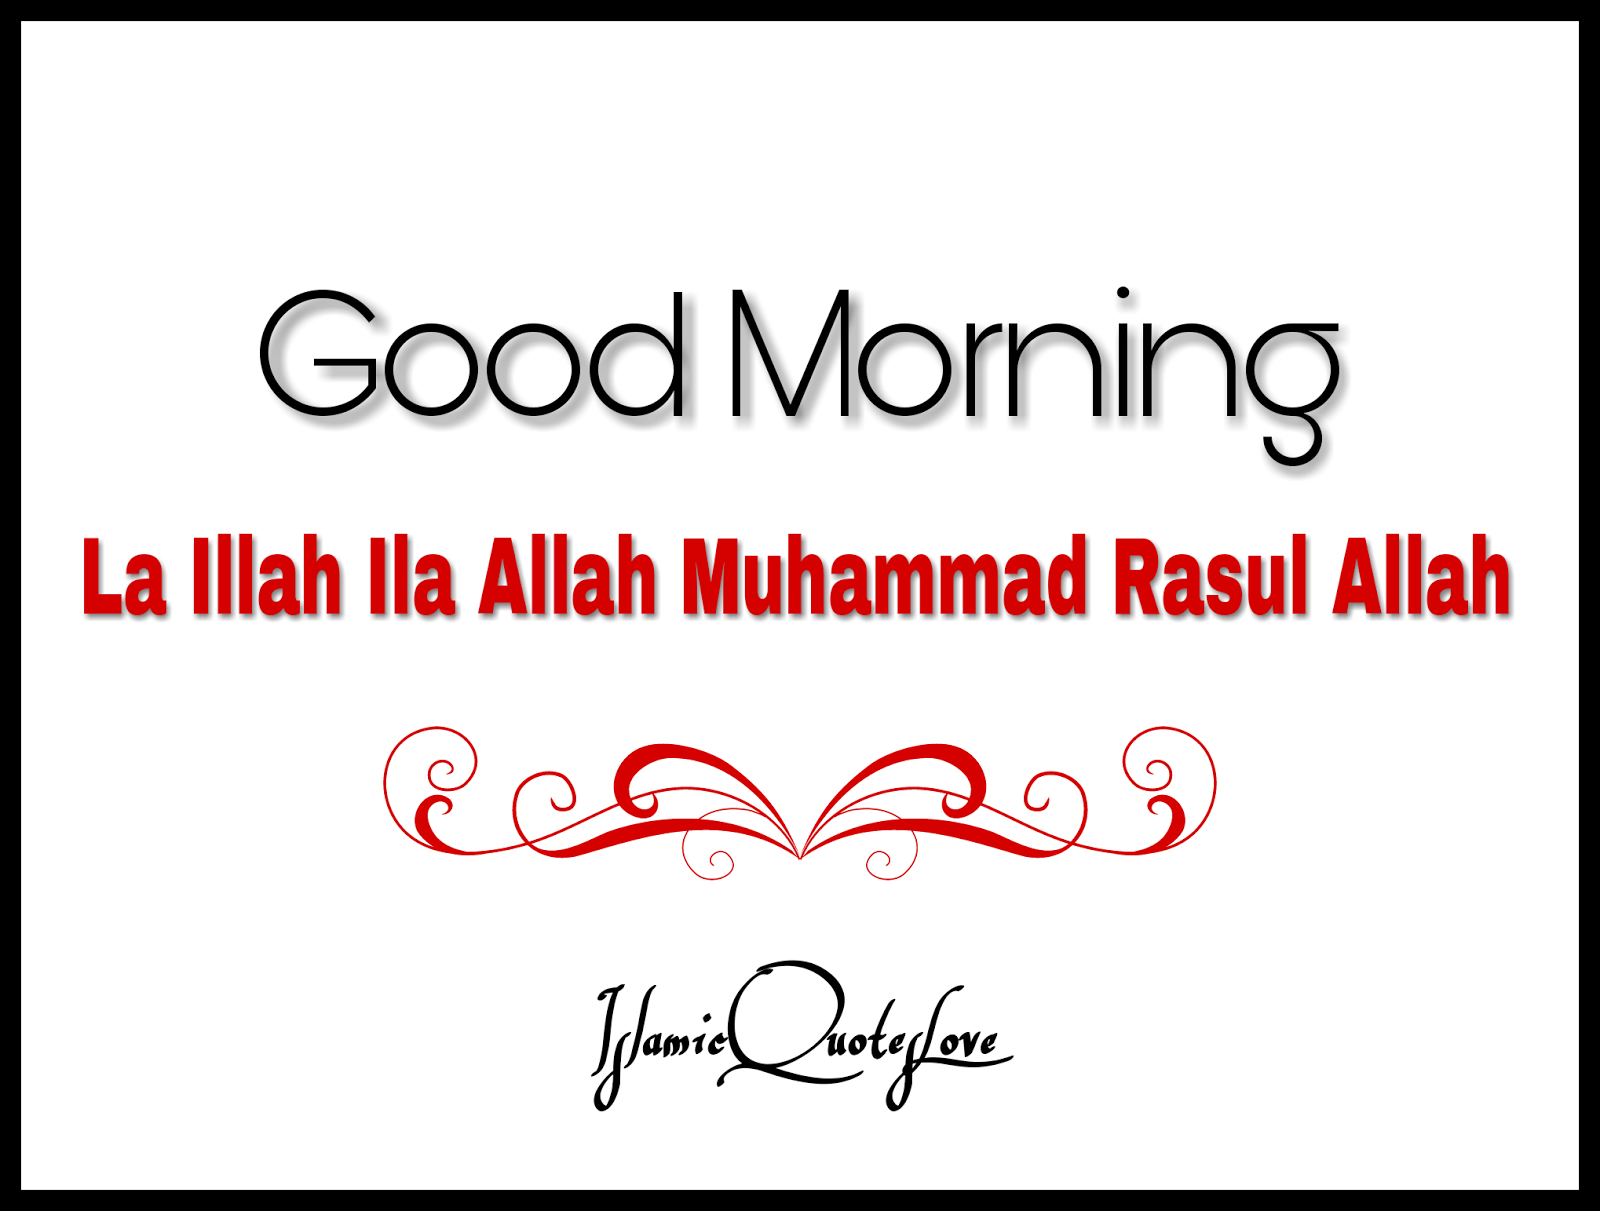 Good Morning Quotes Allah : Good morning with the beautiful kalma la illah ila allah